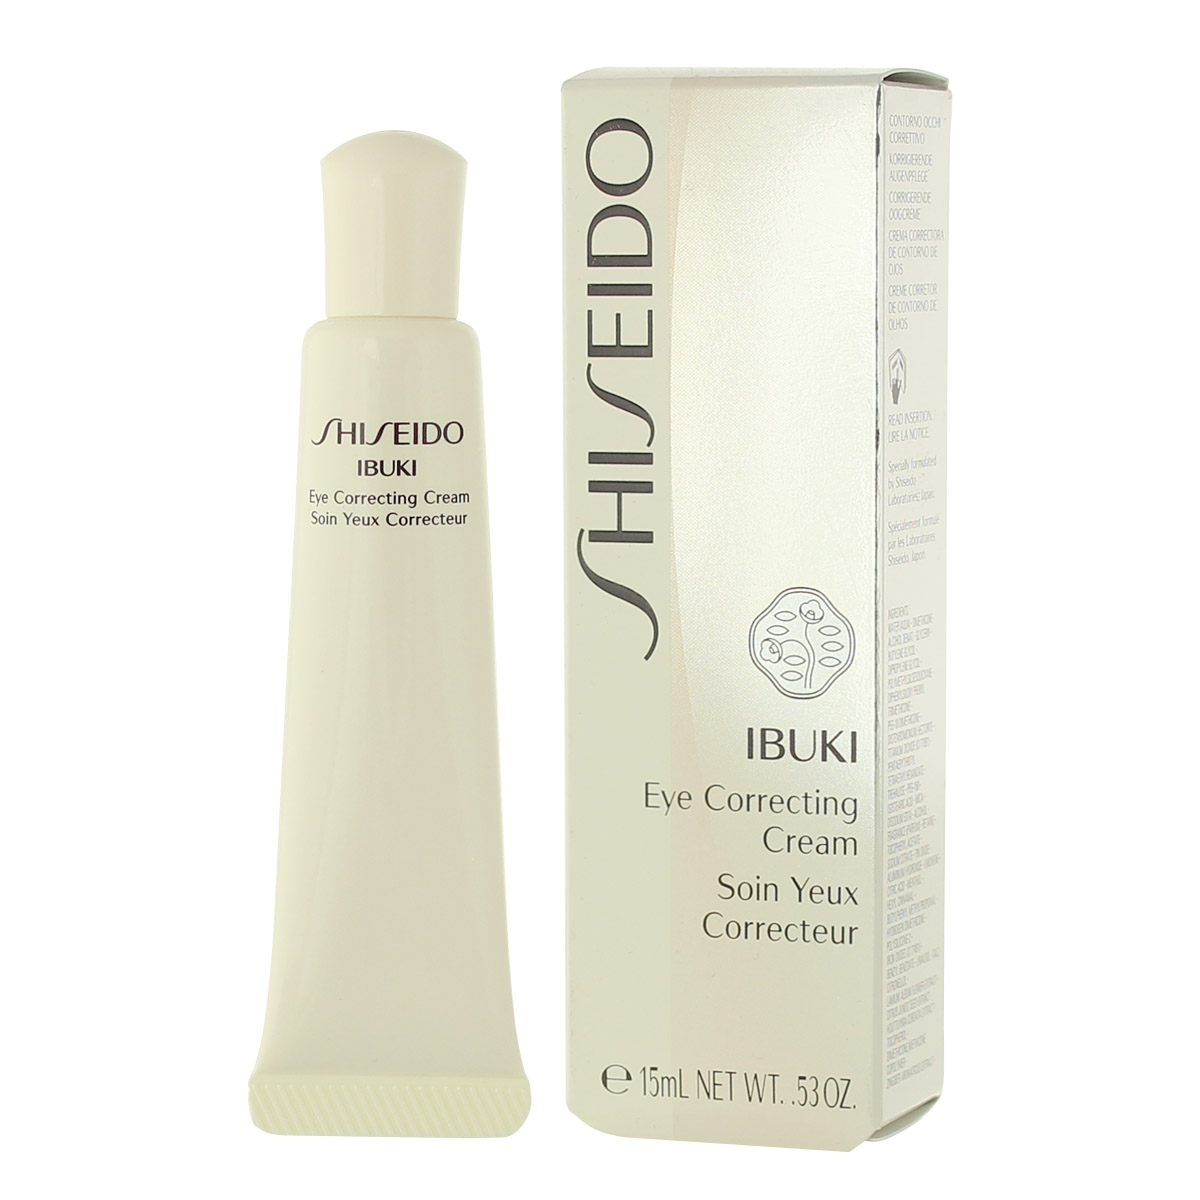 Shiseido Ibuki Eye Correcting Cream 15 ml